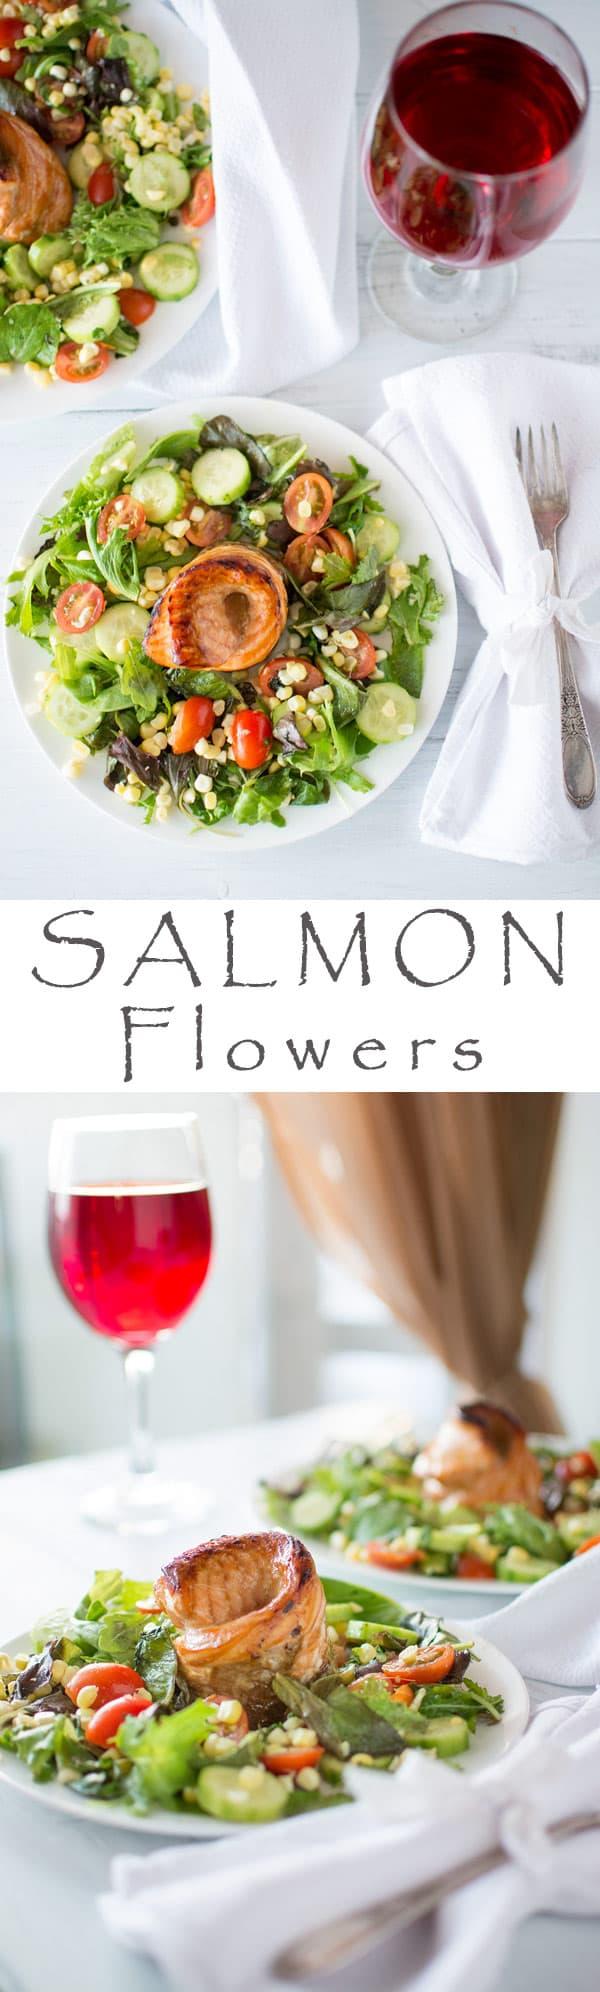 salmon flowers